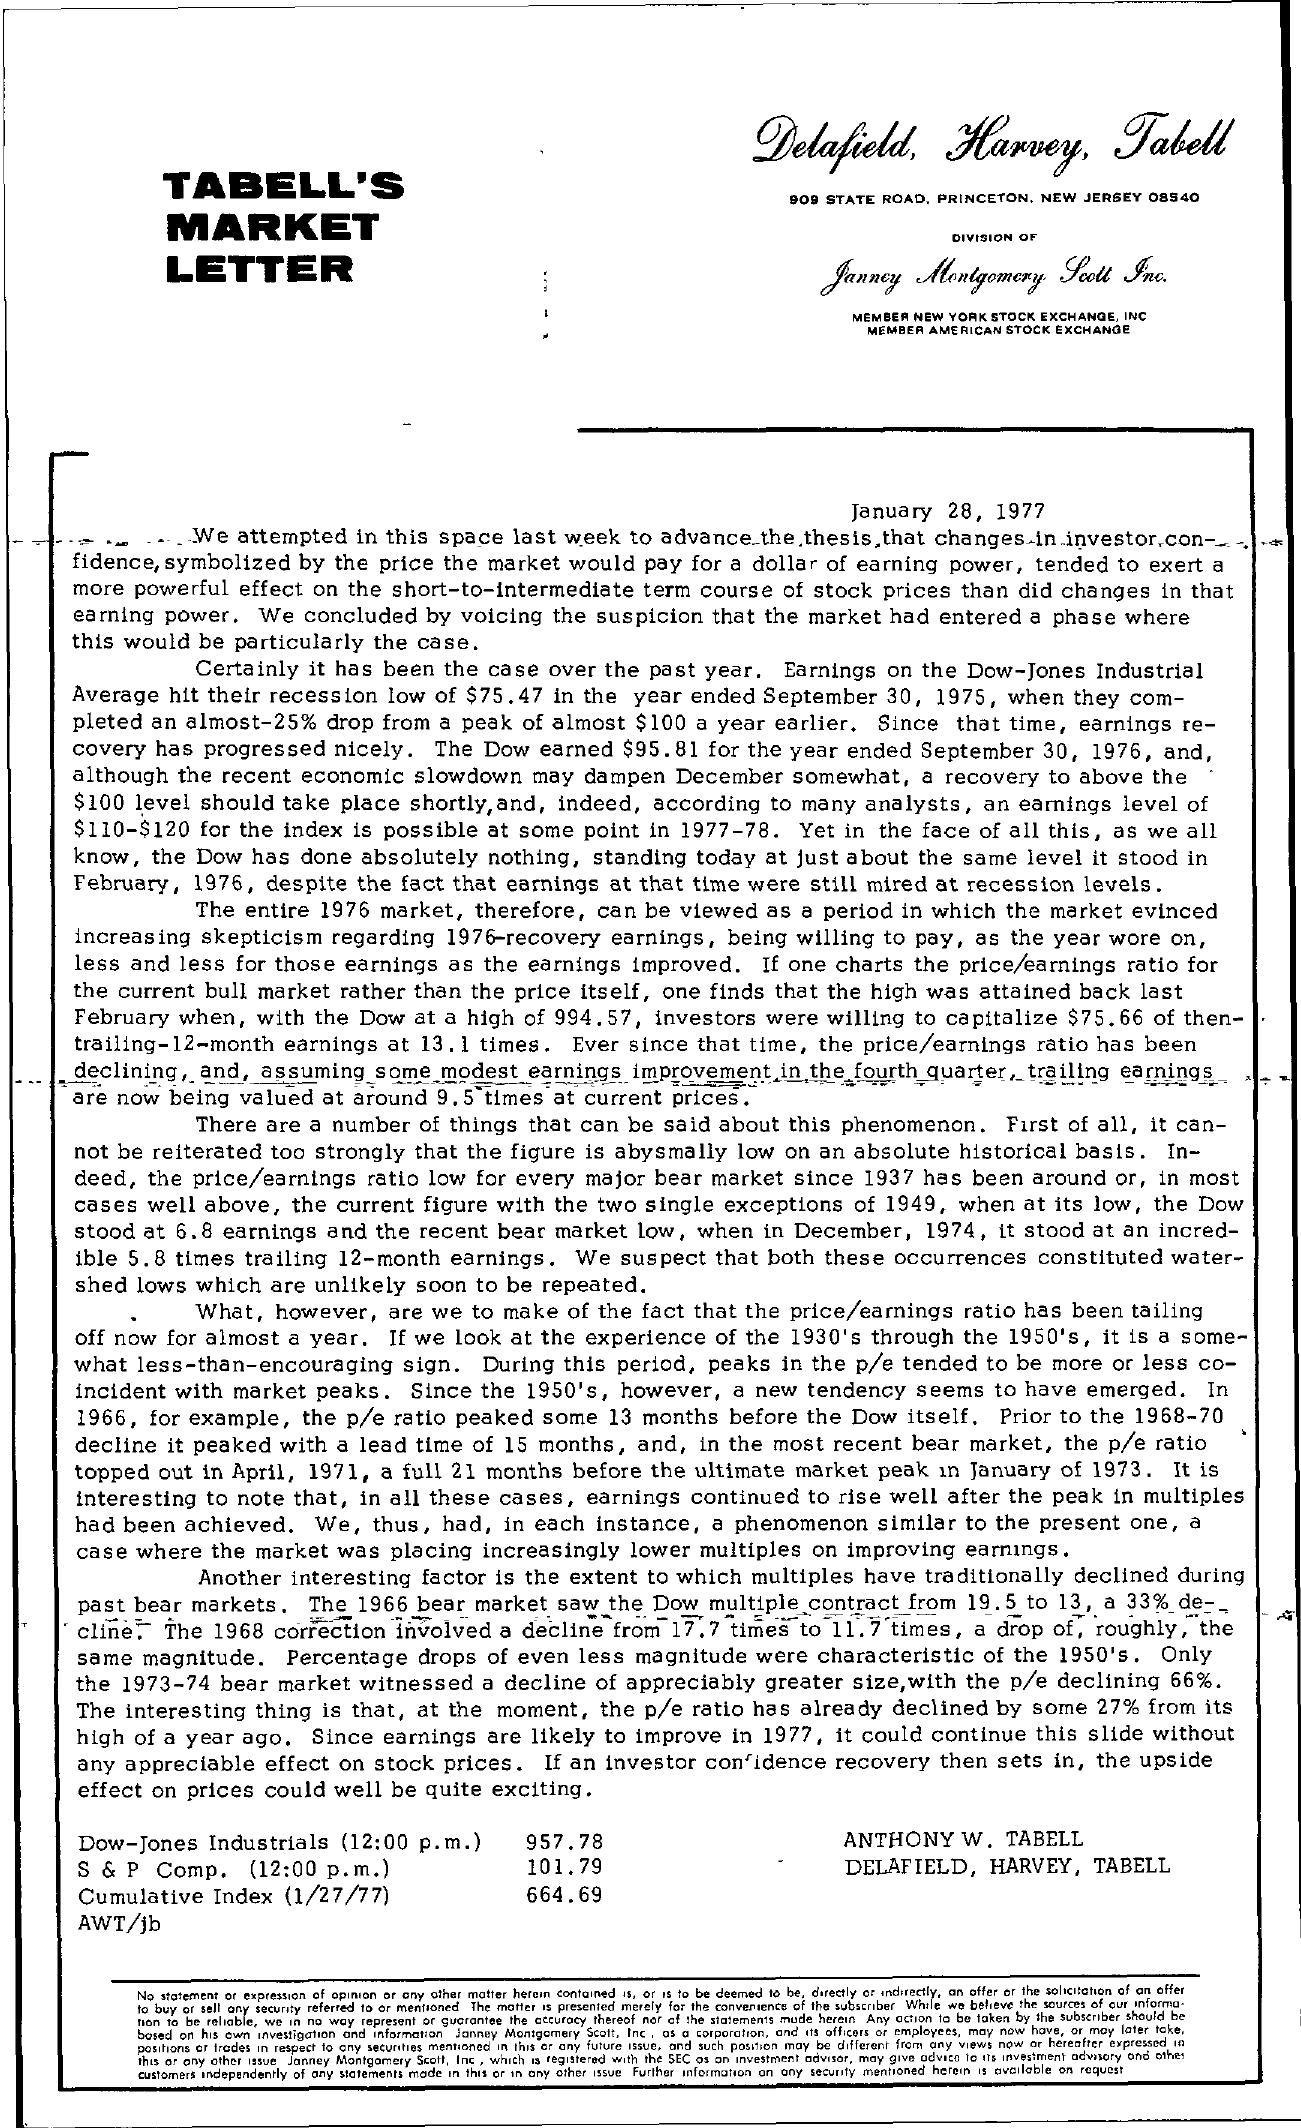 Tabell's Market Letter - January 28, 1977